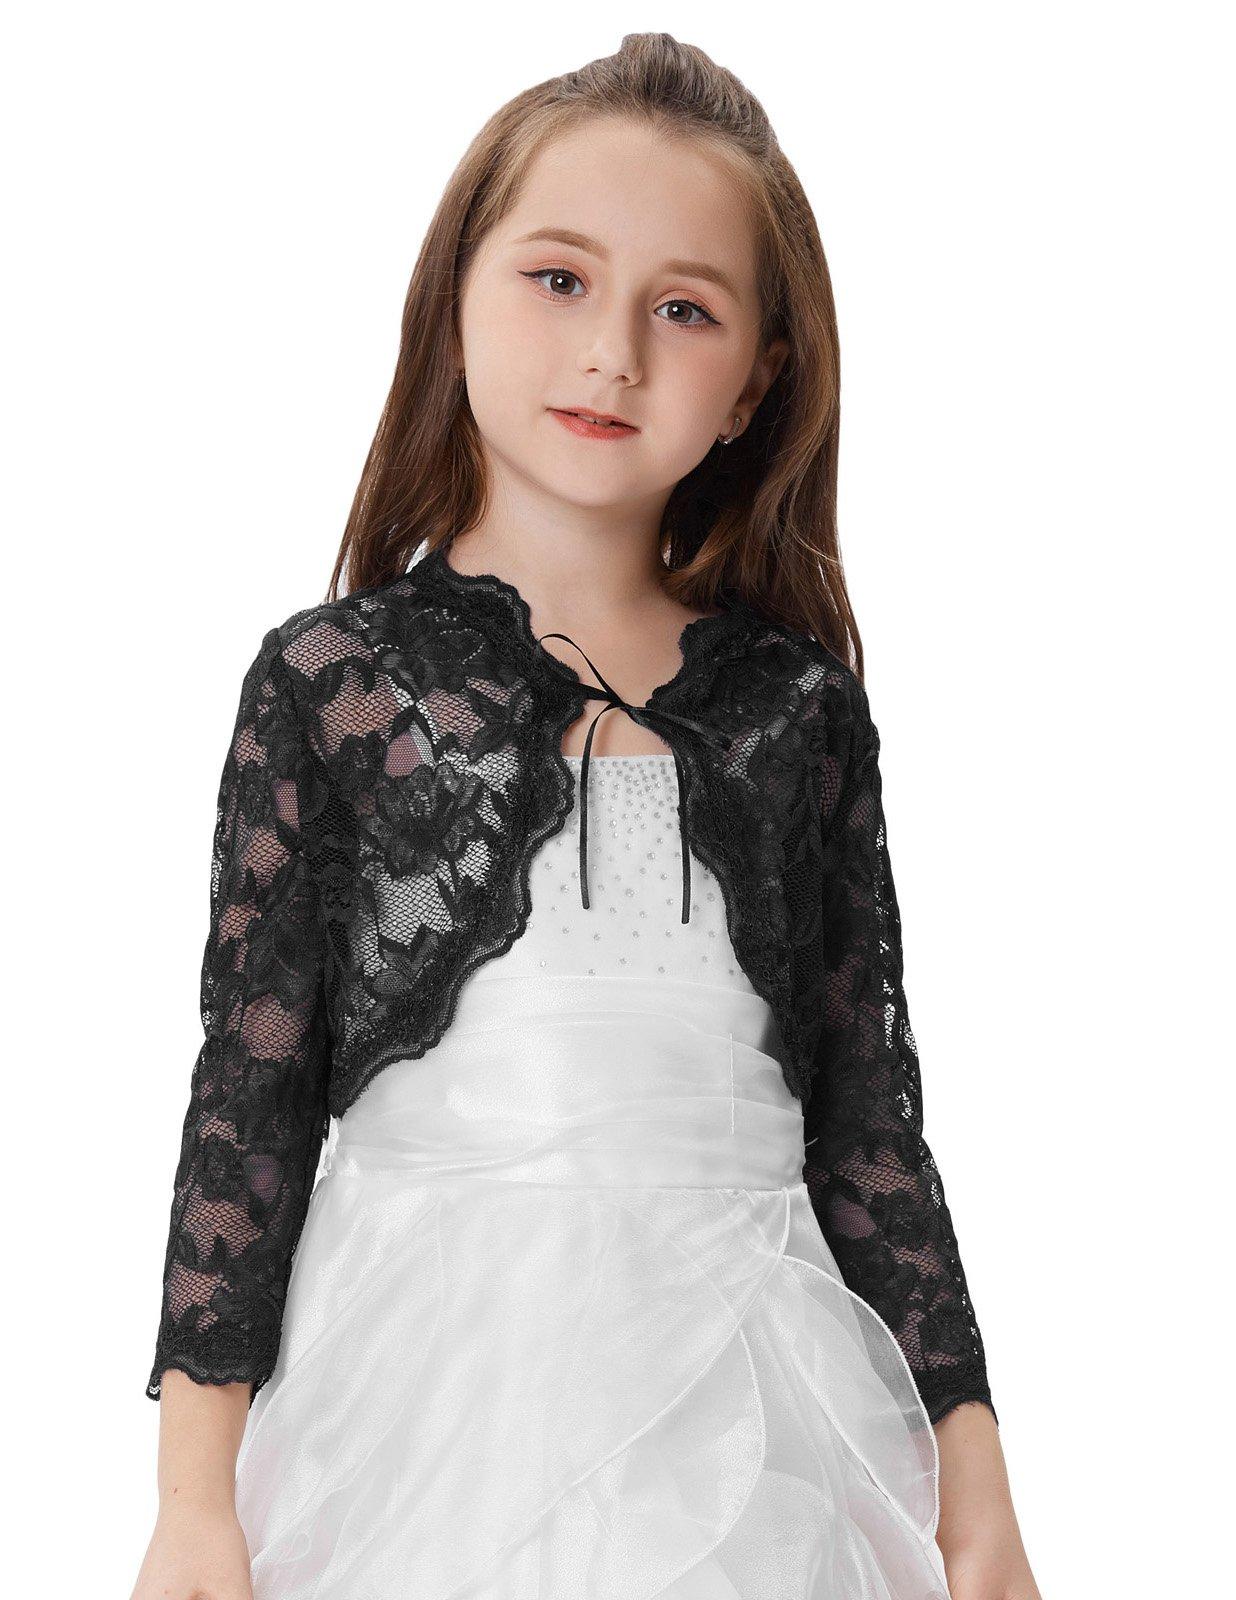 GRACE KARIN Little Girls Lace Bolero Cardigan Shrug 7~8yrs CL664-3